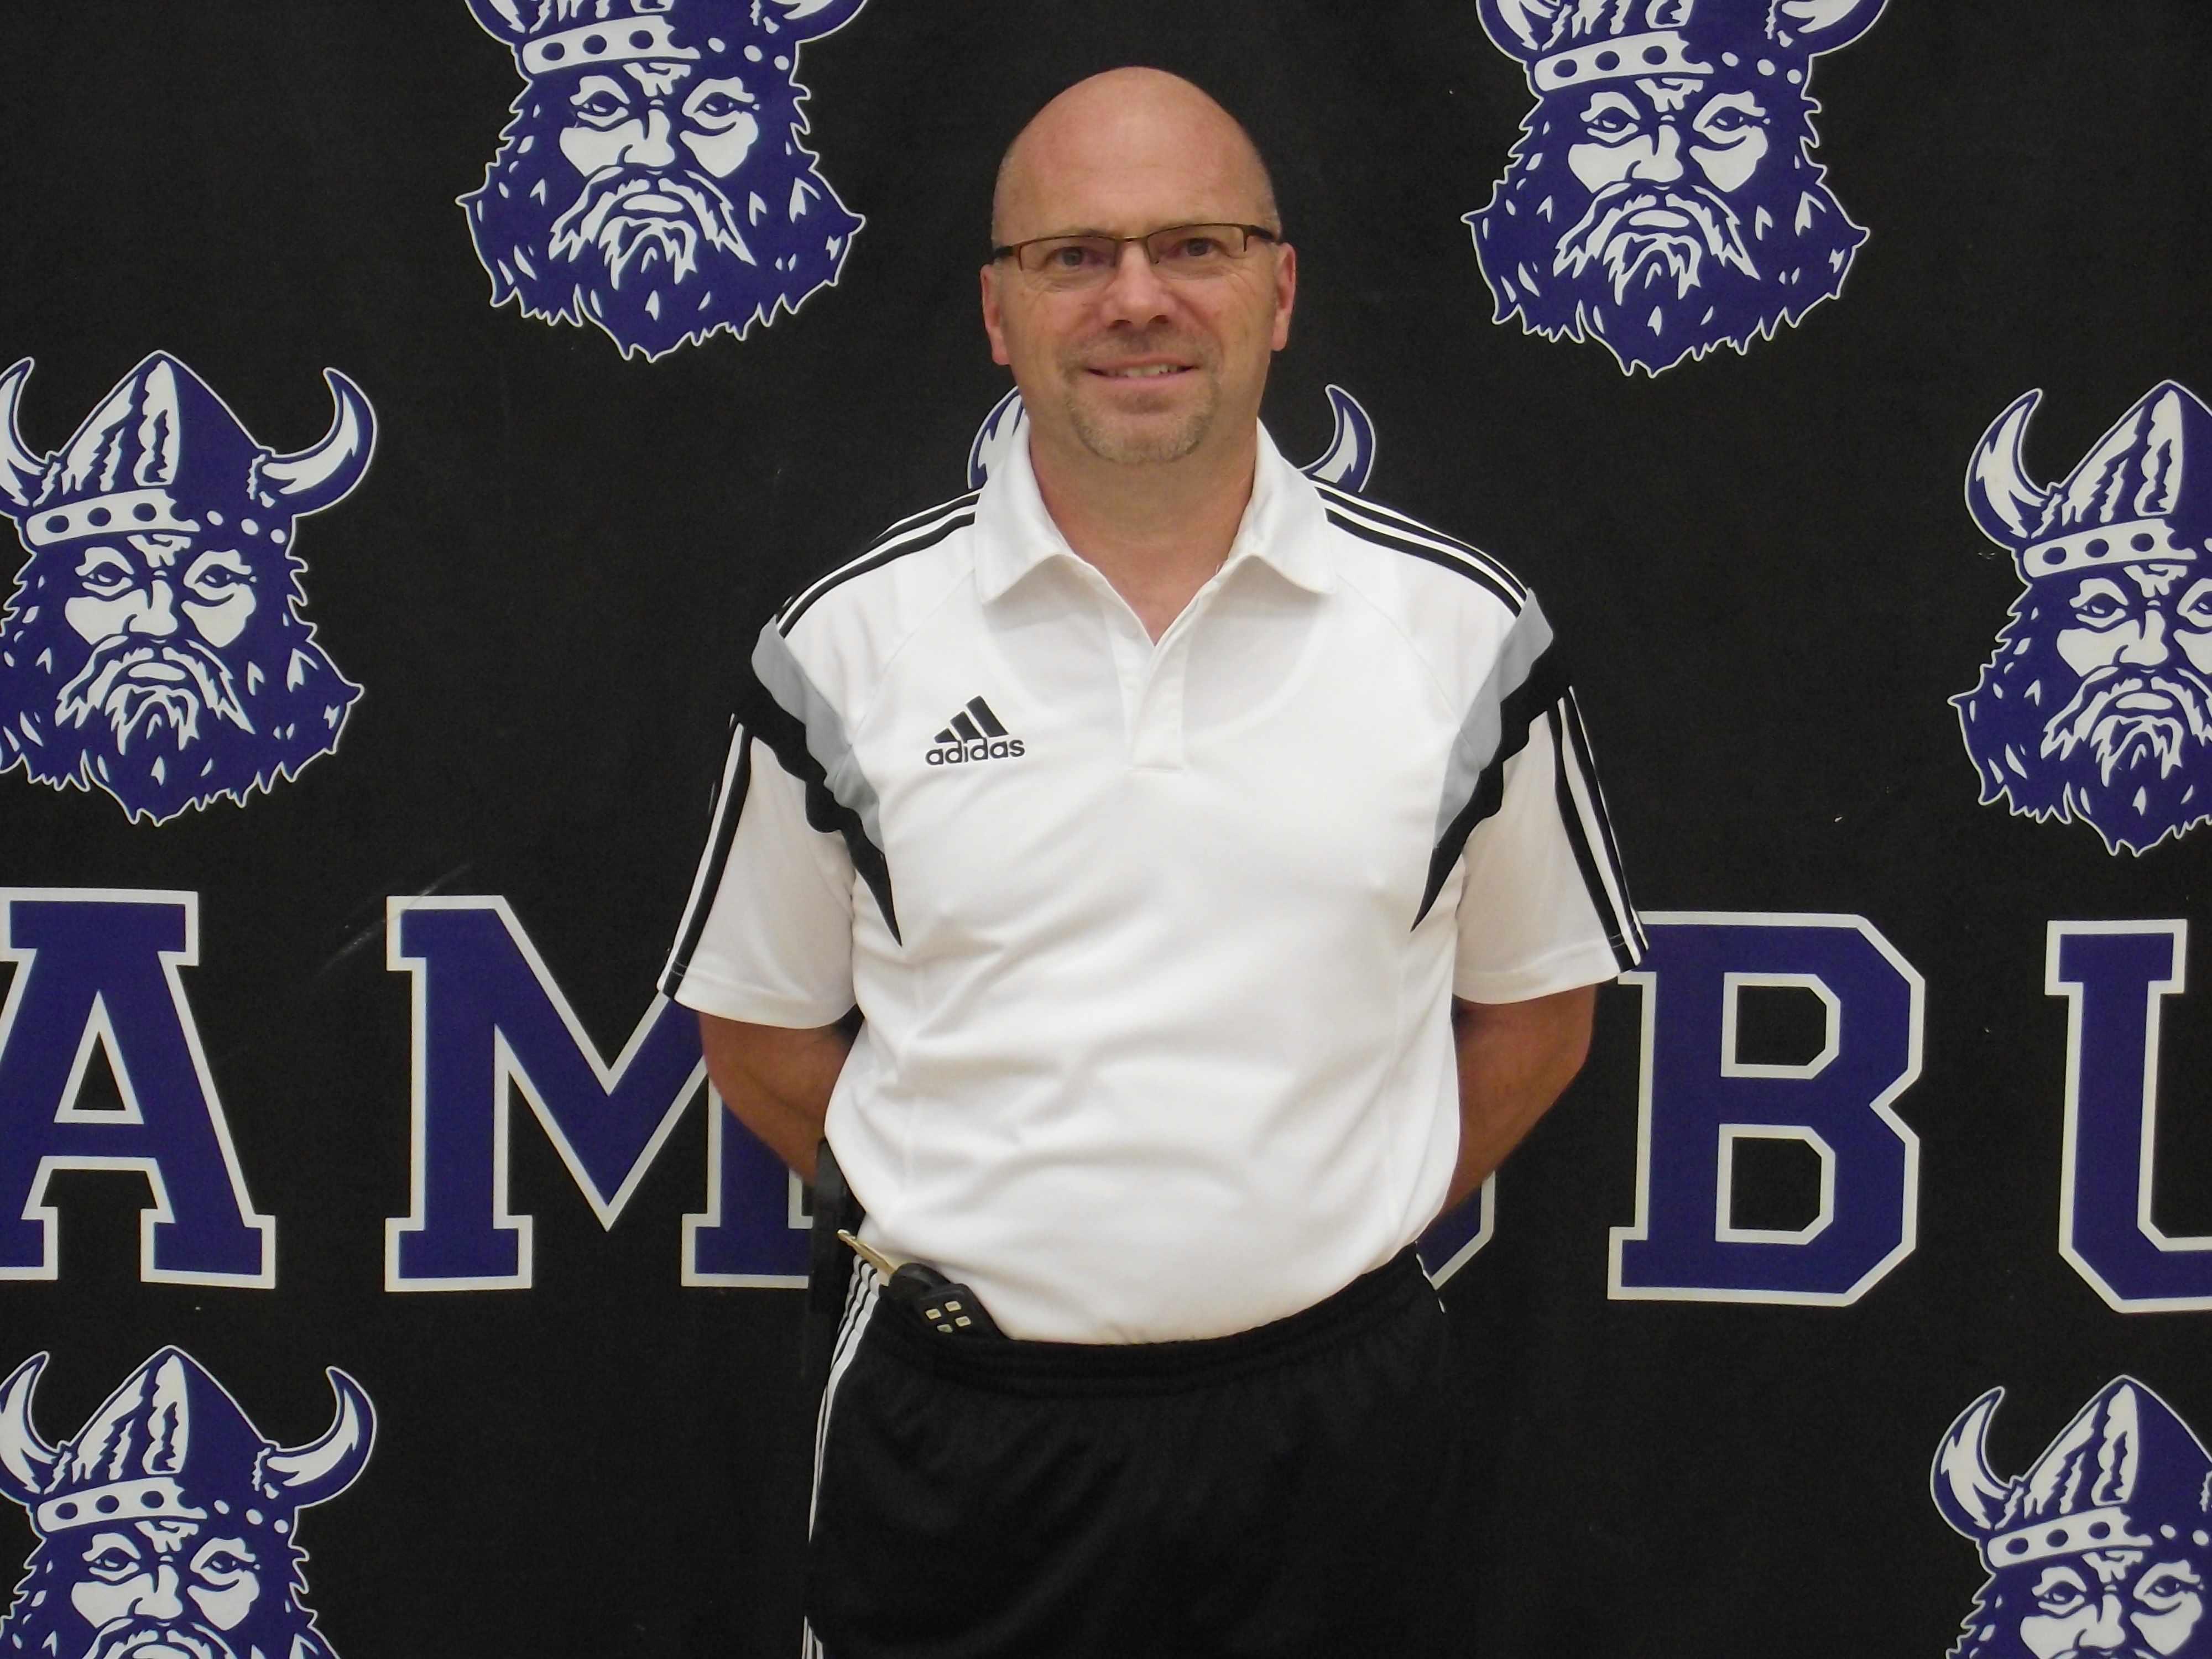 Coach Frank